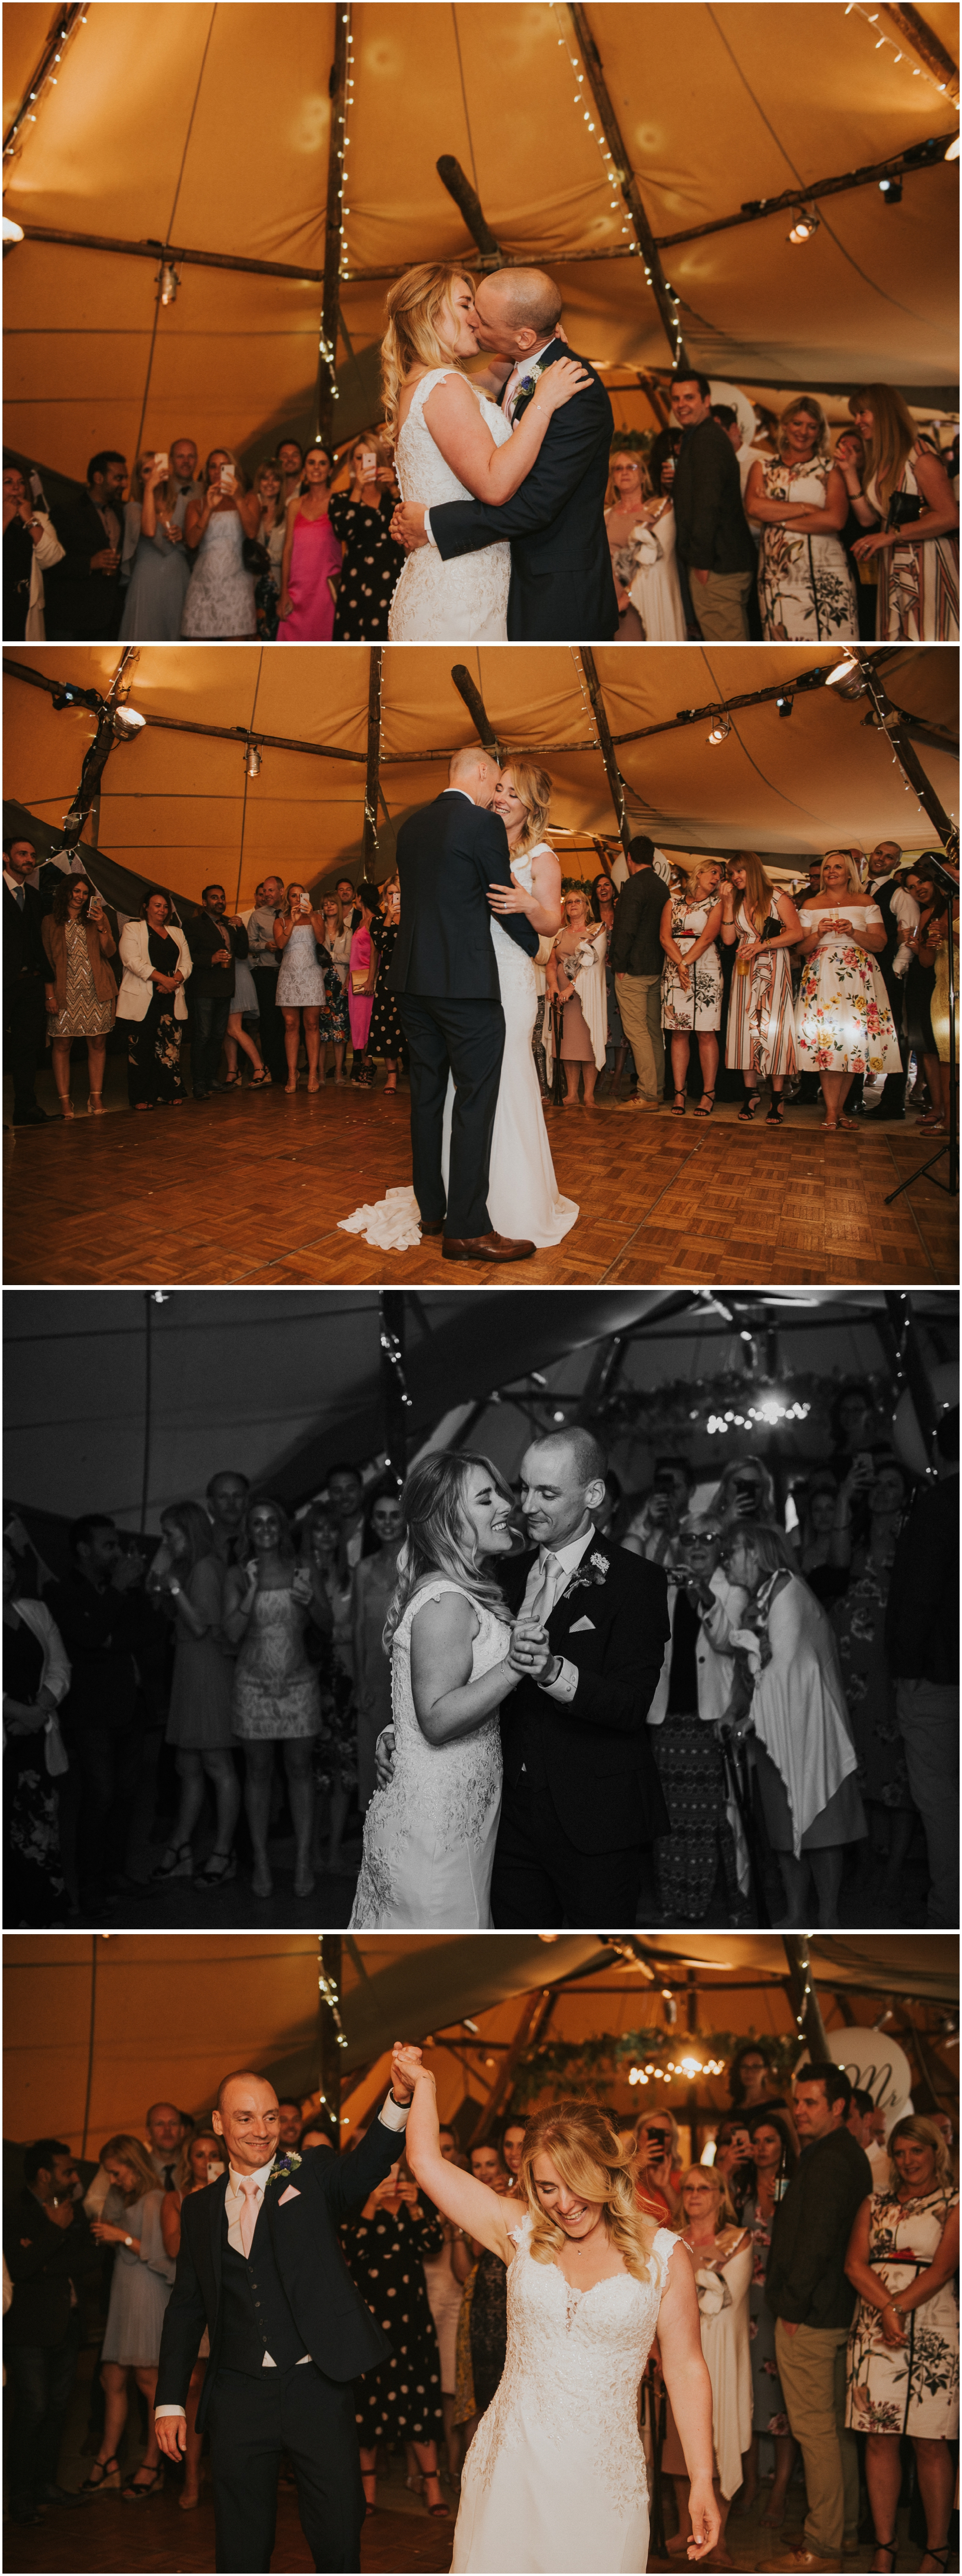 SkipbridegFarmWedding-LukeHolroyd-Yorkshirewedding_0139.jpg